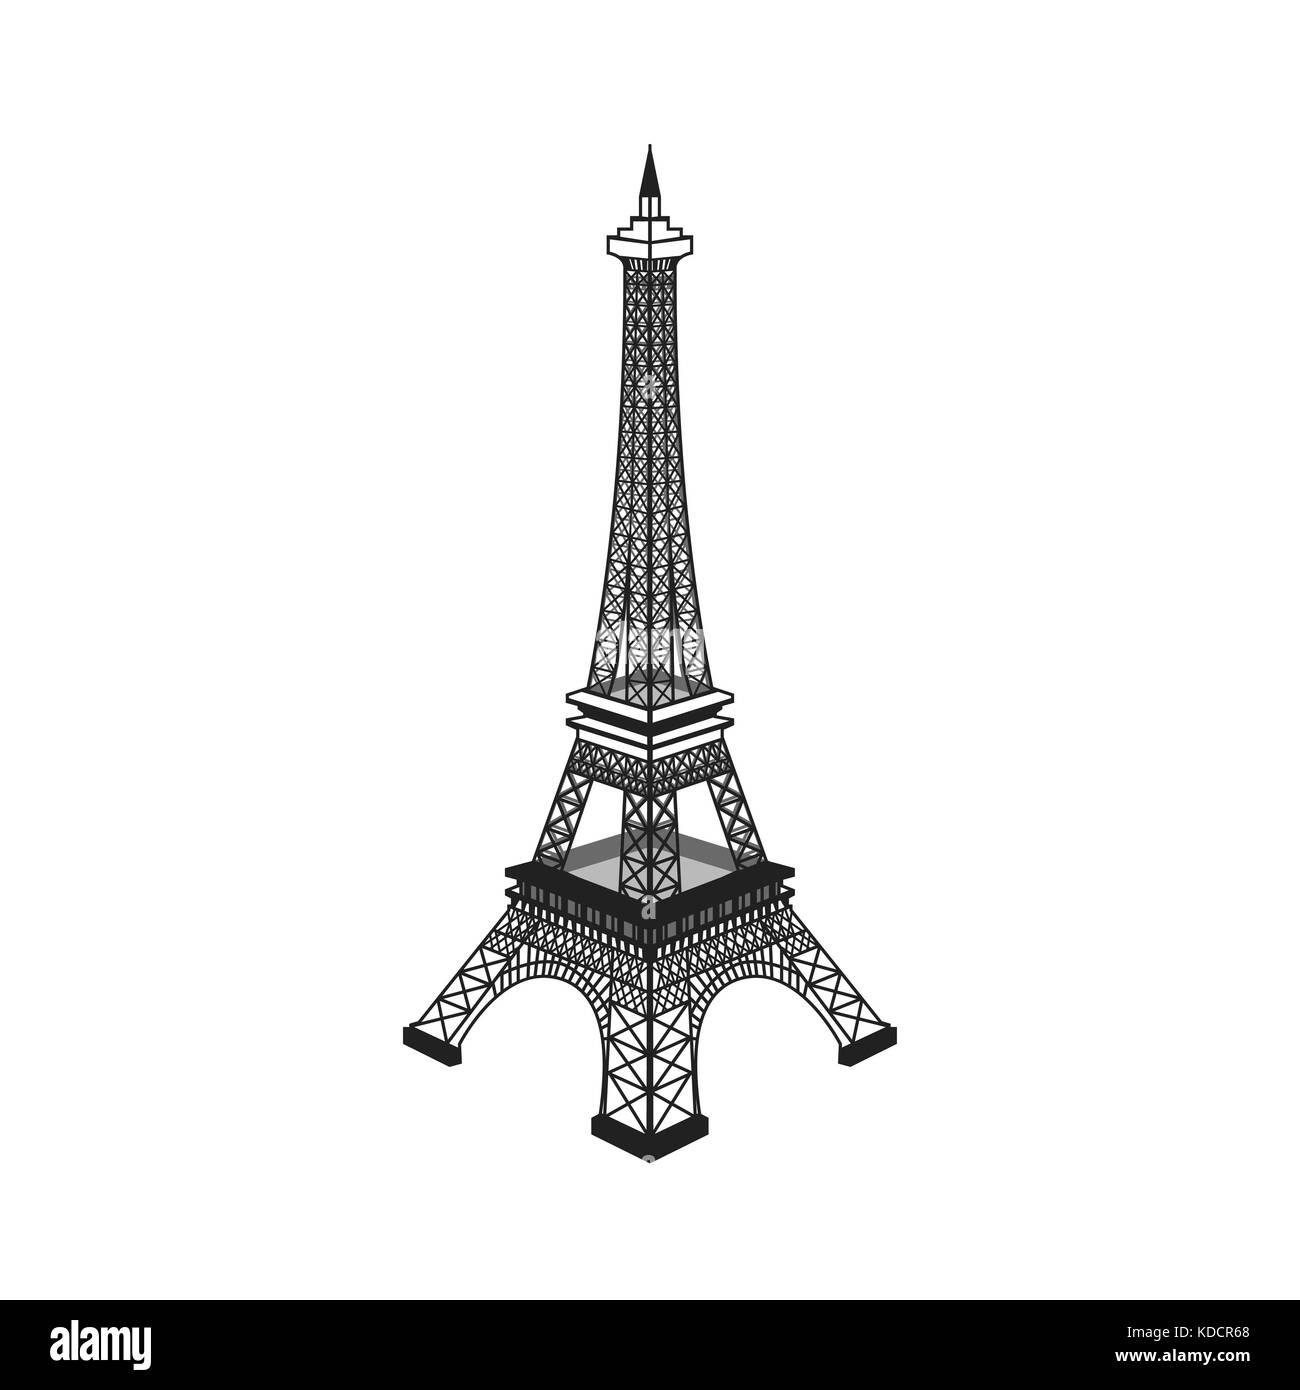 Eiffel tower vector illustration ,Paris. Icon design - Stock Image